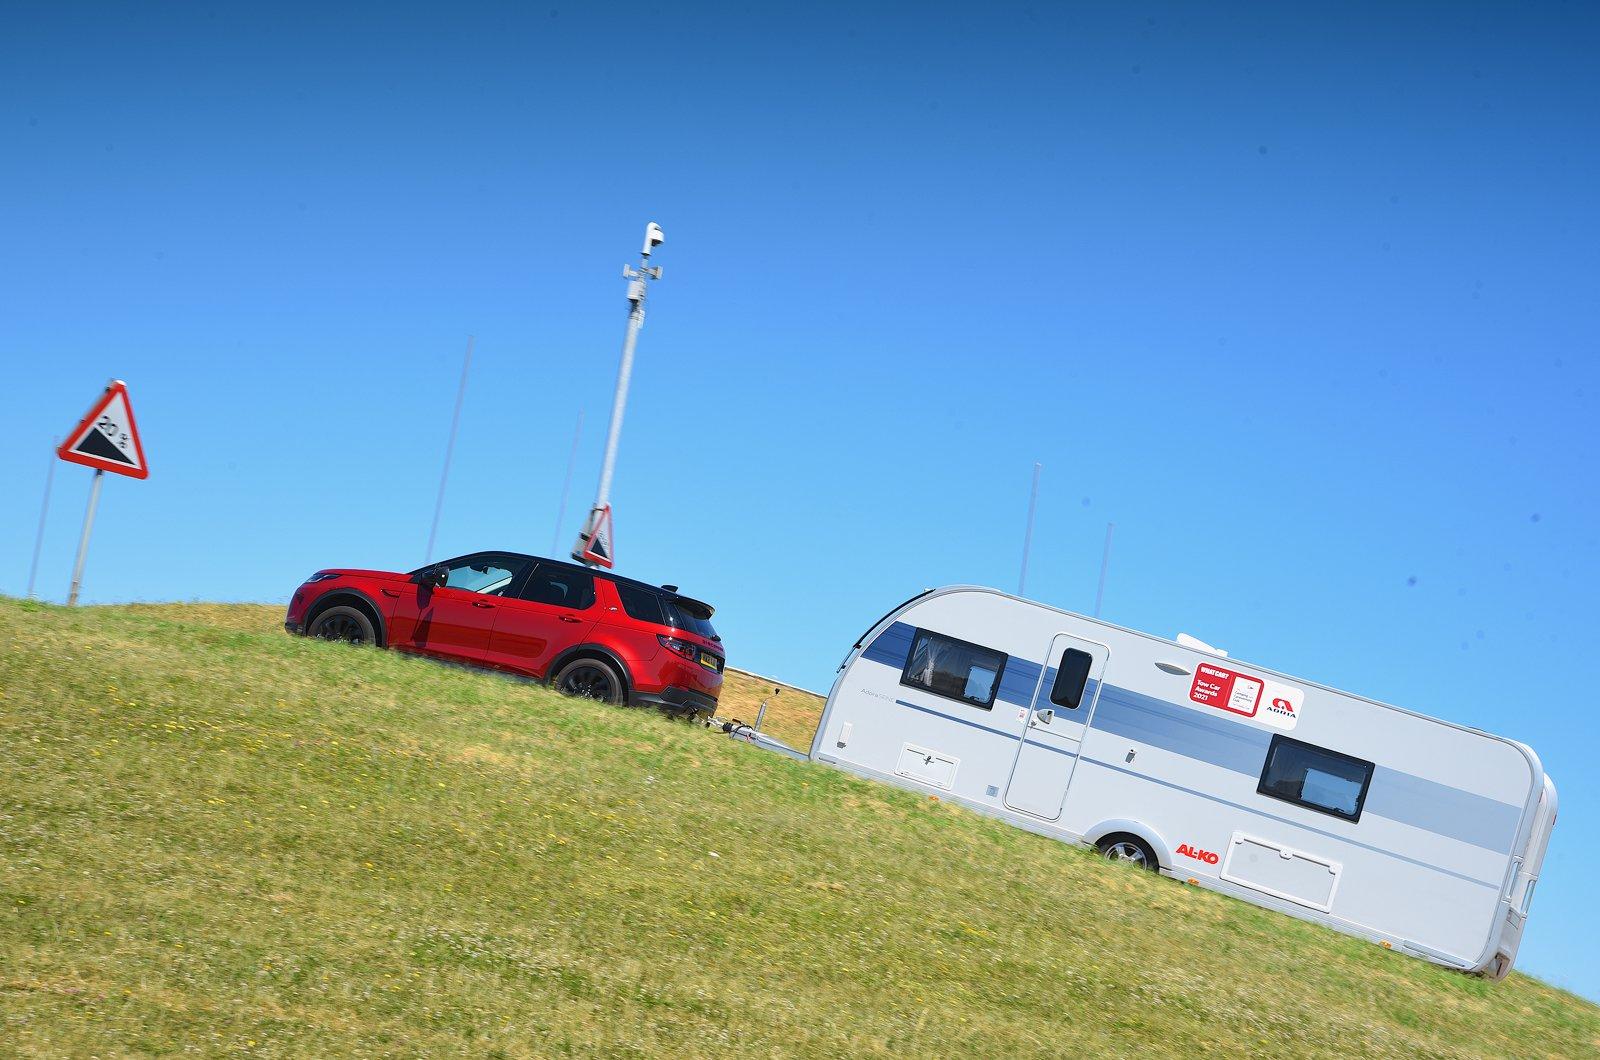 Tow Car Awards 2021 - hill test